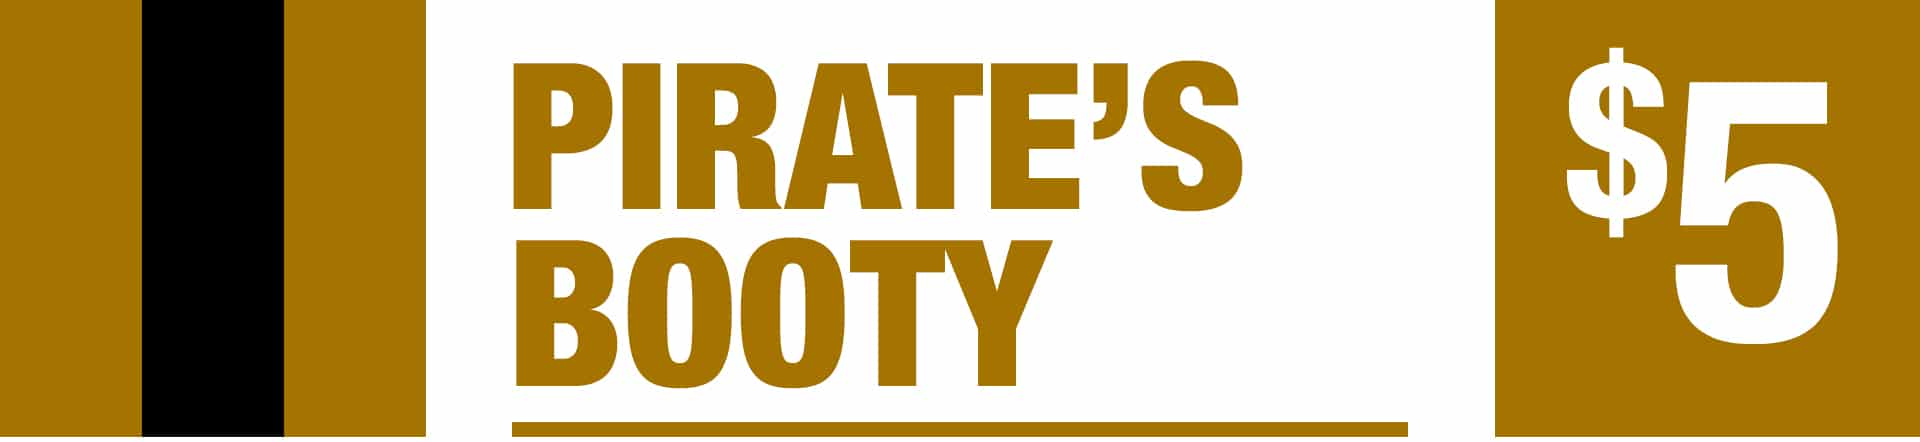 Pirate's Boot - Five Dollar Jackpot